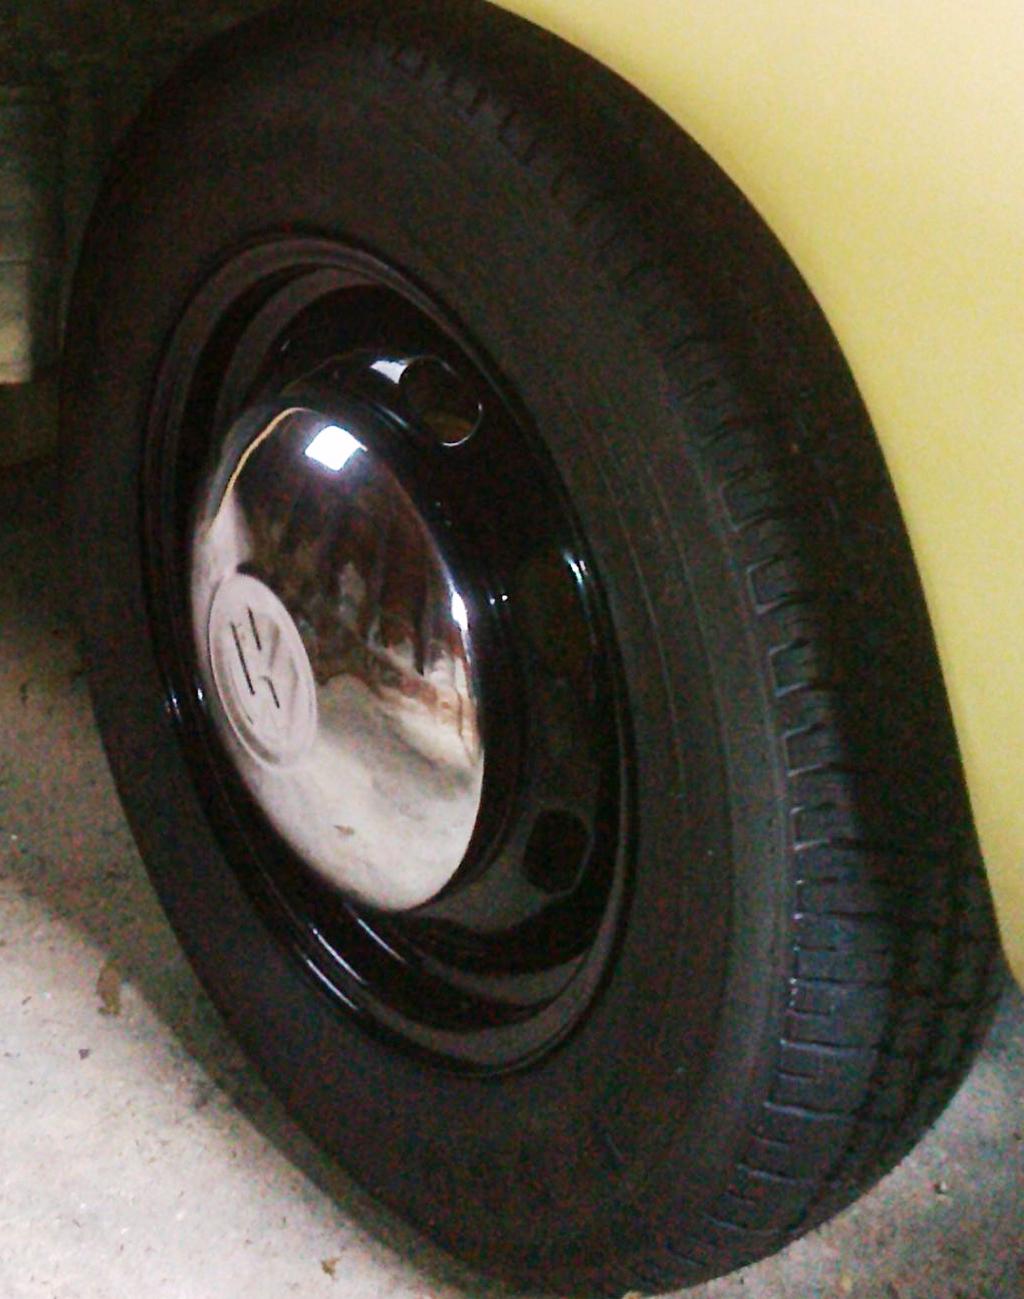 1969 Volkswagen Karmann Ghia wheel